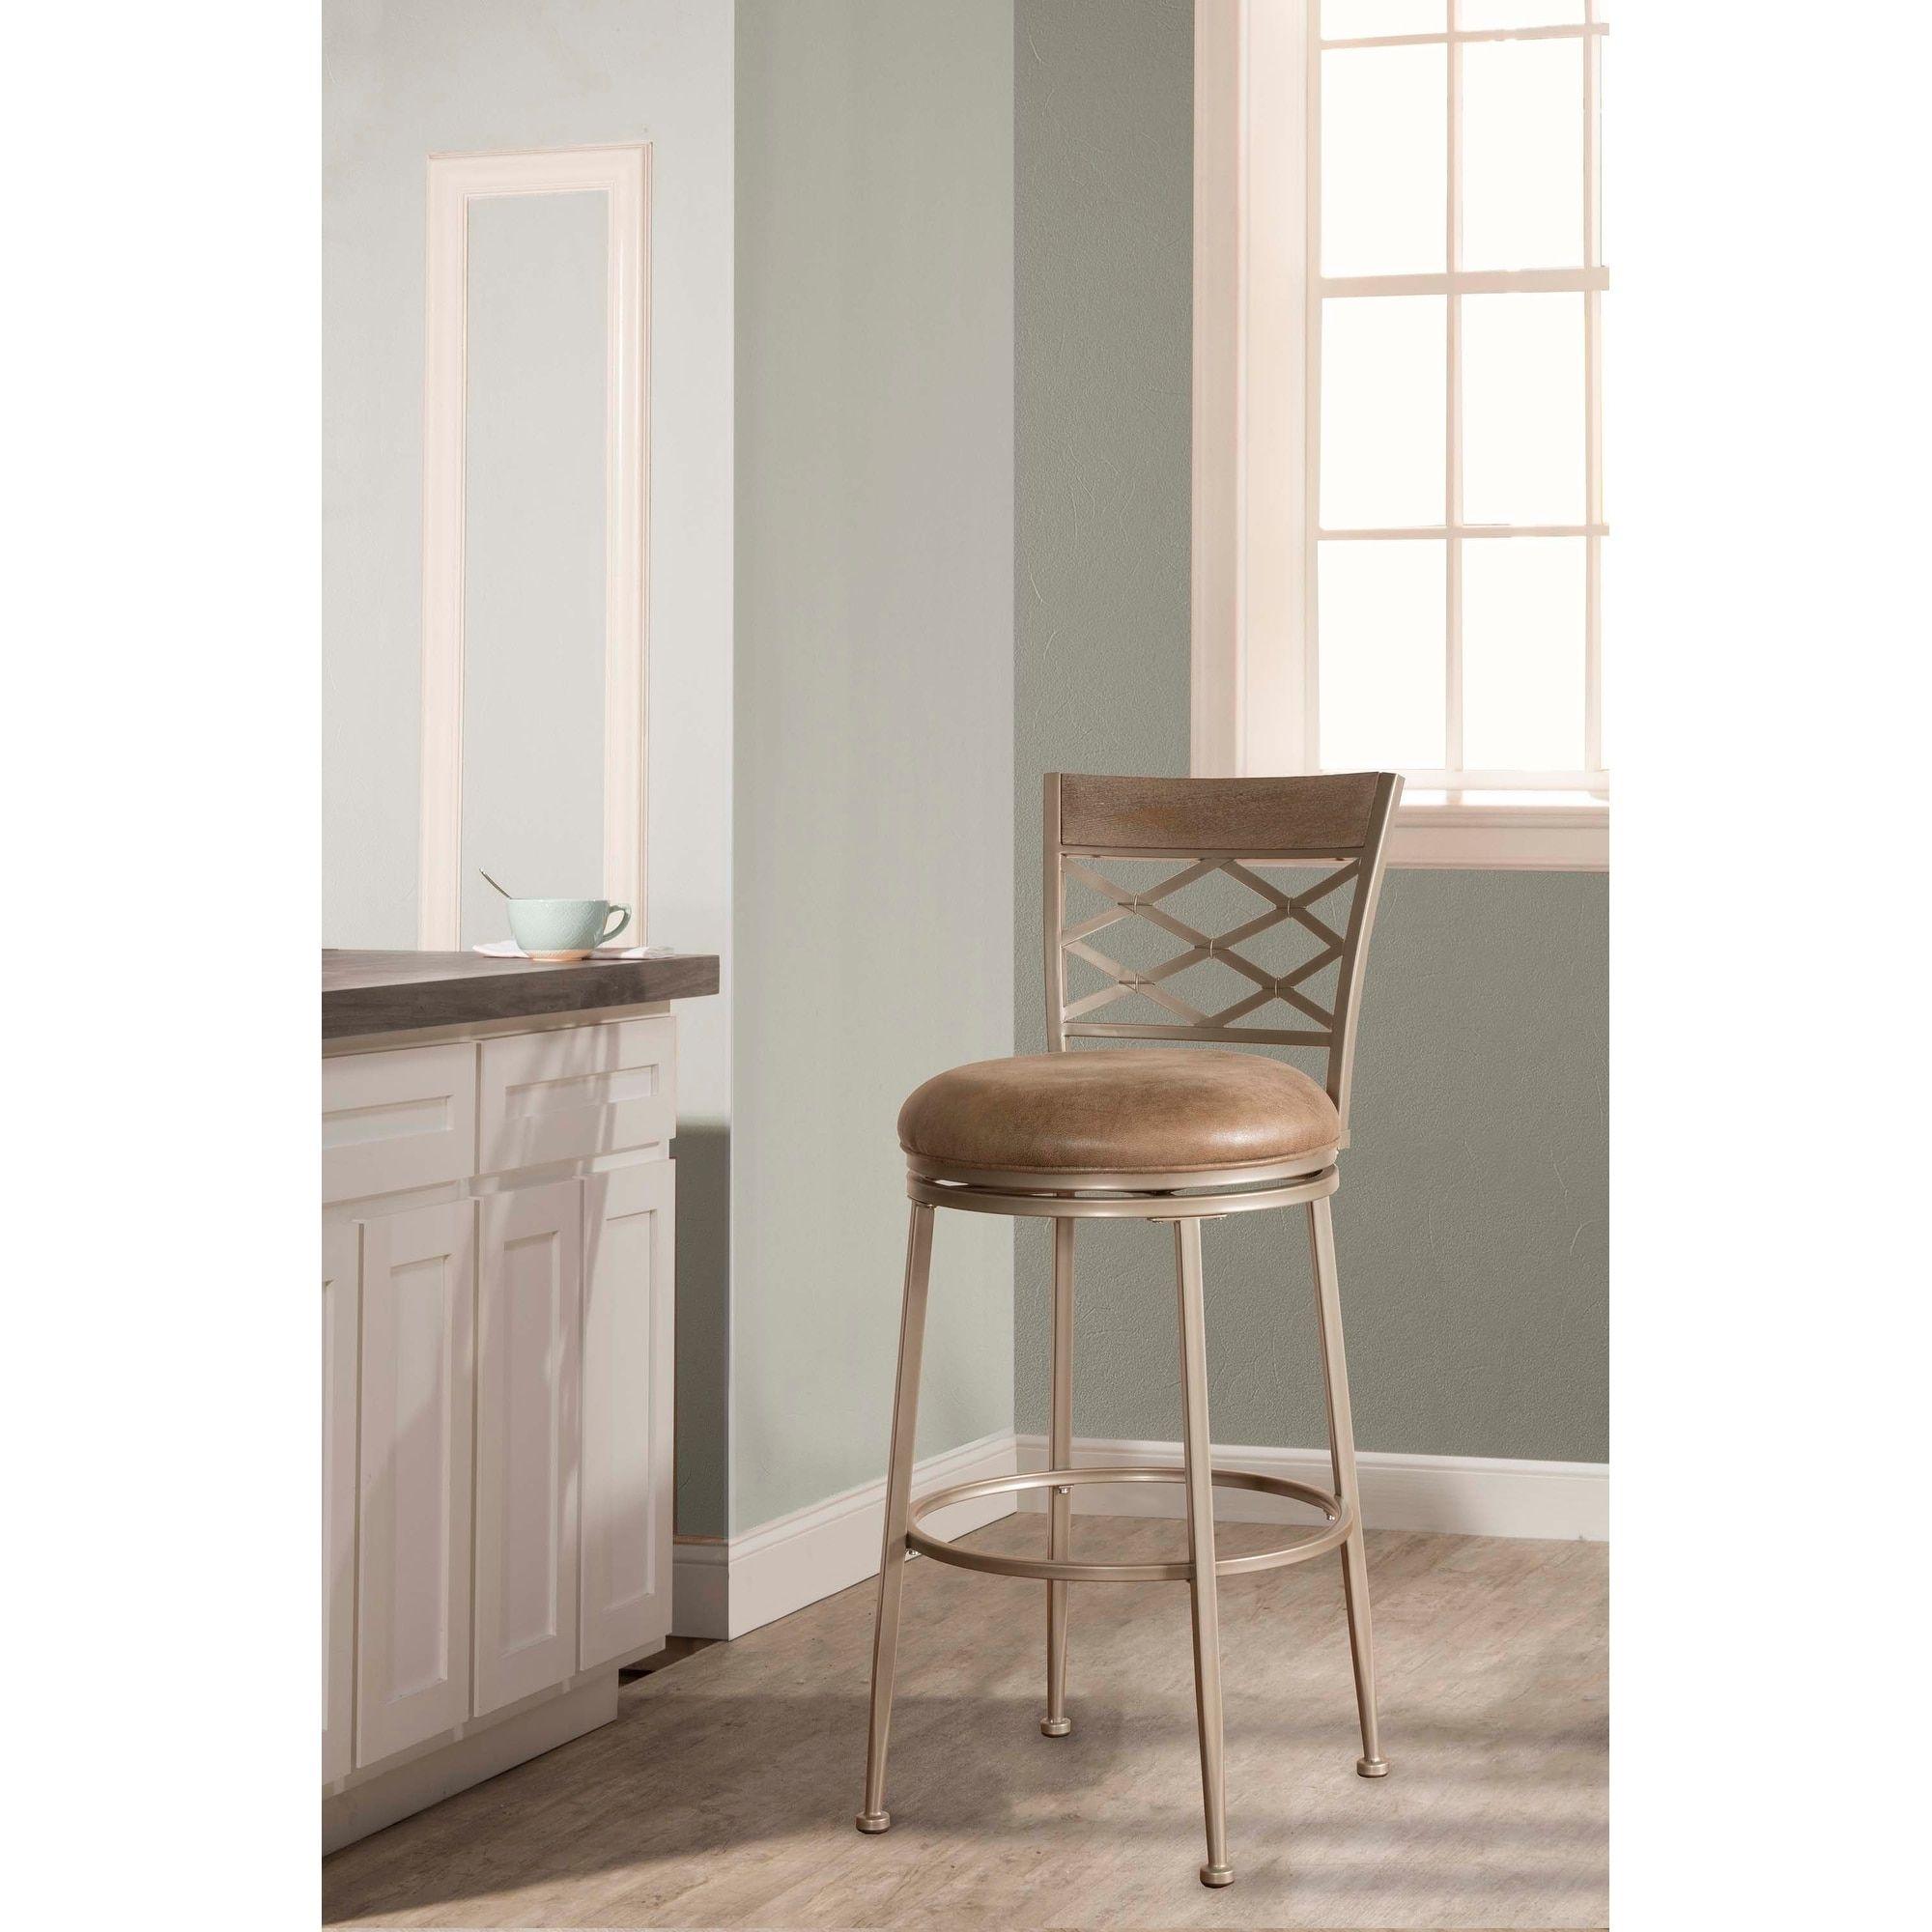 Astonishing Hillsdale Furniture Hutchinson Pewter 26 Inch Swivel Counter Unemploymentrelief Wooden Chair Designs For Living Room Unemploymentrelieforg